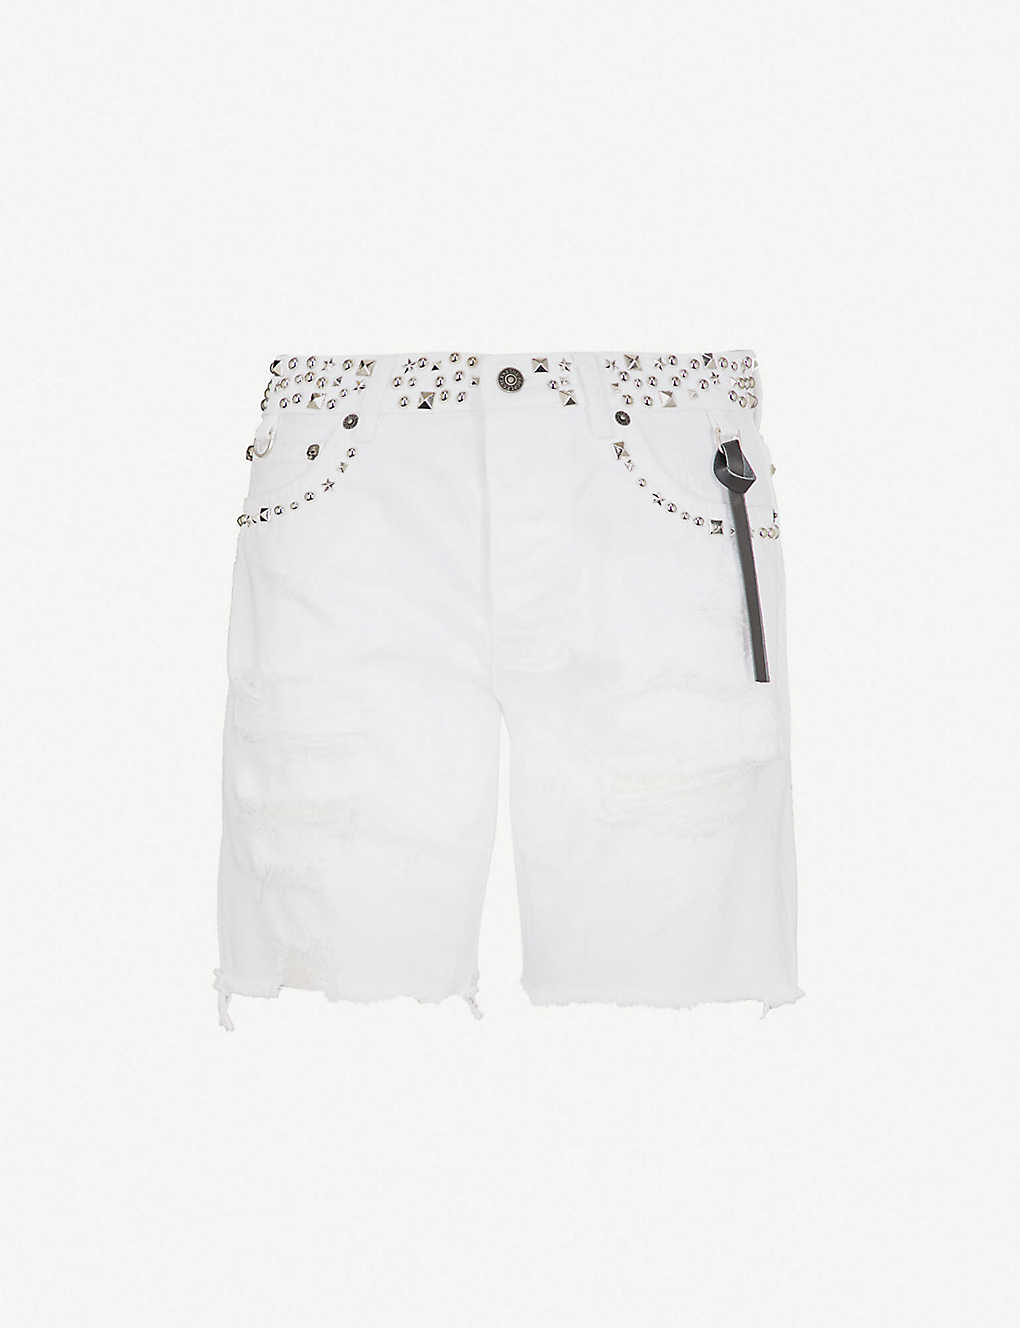 430da32878 THE KOOPLES - Washed denim shorts with ethnic embroide | Selfridges.com